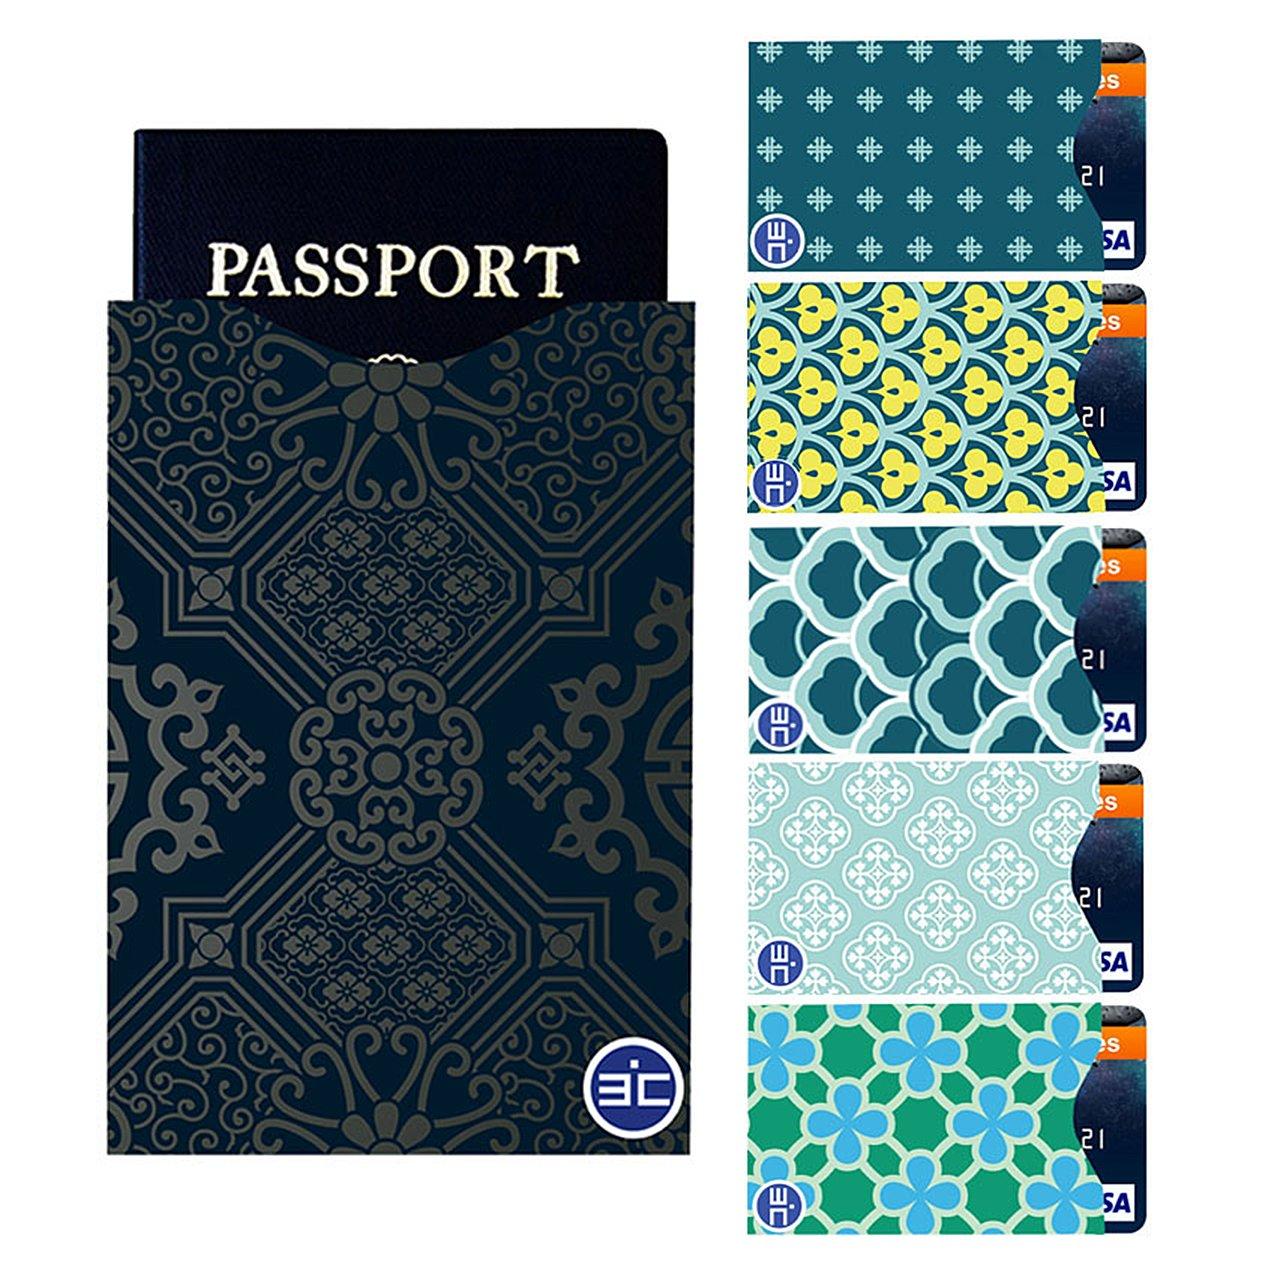 I3C RFID Blocking Kreditkartenhülle Reisepasshülle Datenschutzhülle RFID-Blocker Schutzhülle Set (5 Stück Kreditkartenhülle mit 1 Stück Reisepasshülle)